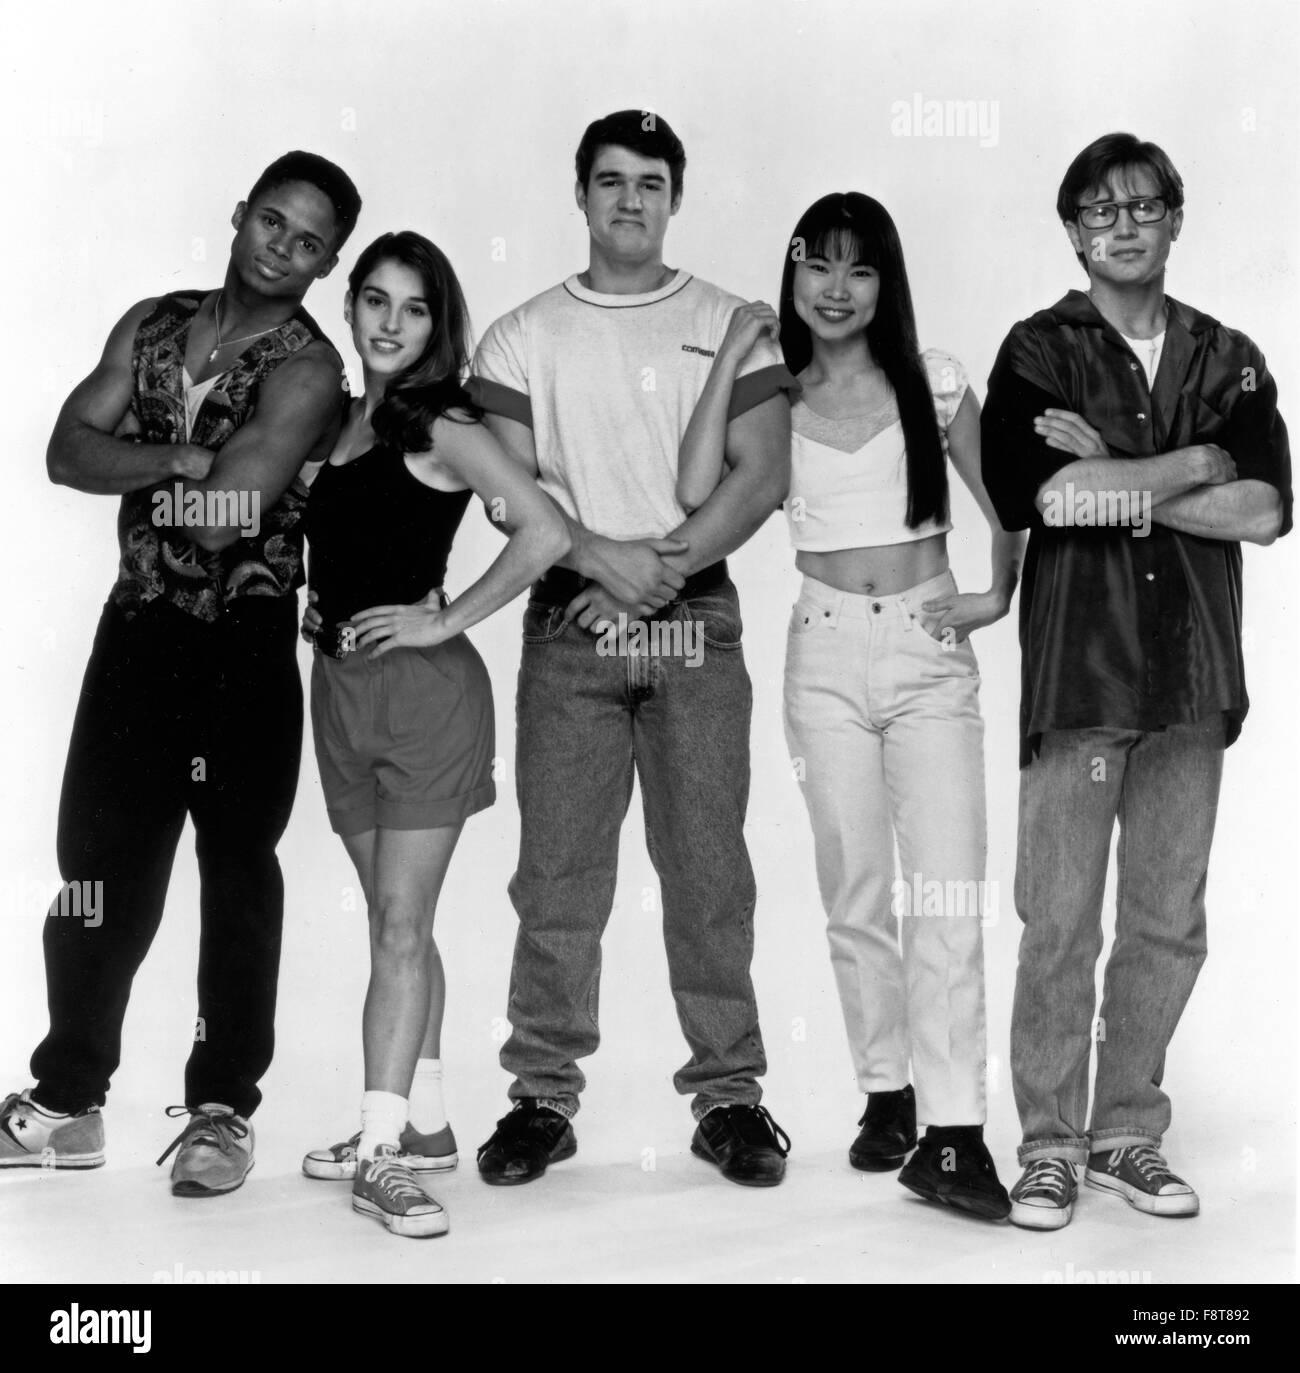 Mighty Morphin Power Rangers, Actionserie, USA 1993-1996, Darsteller: Walter Jones, Amy Jo Johnson, Austin St. John, - Stock Image